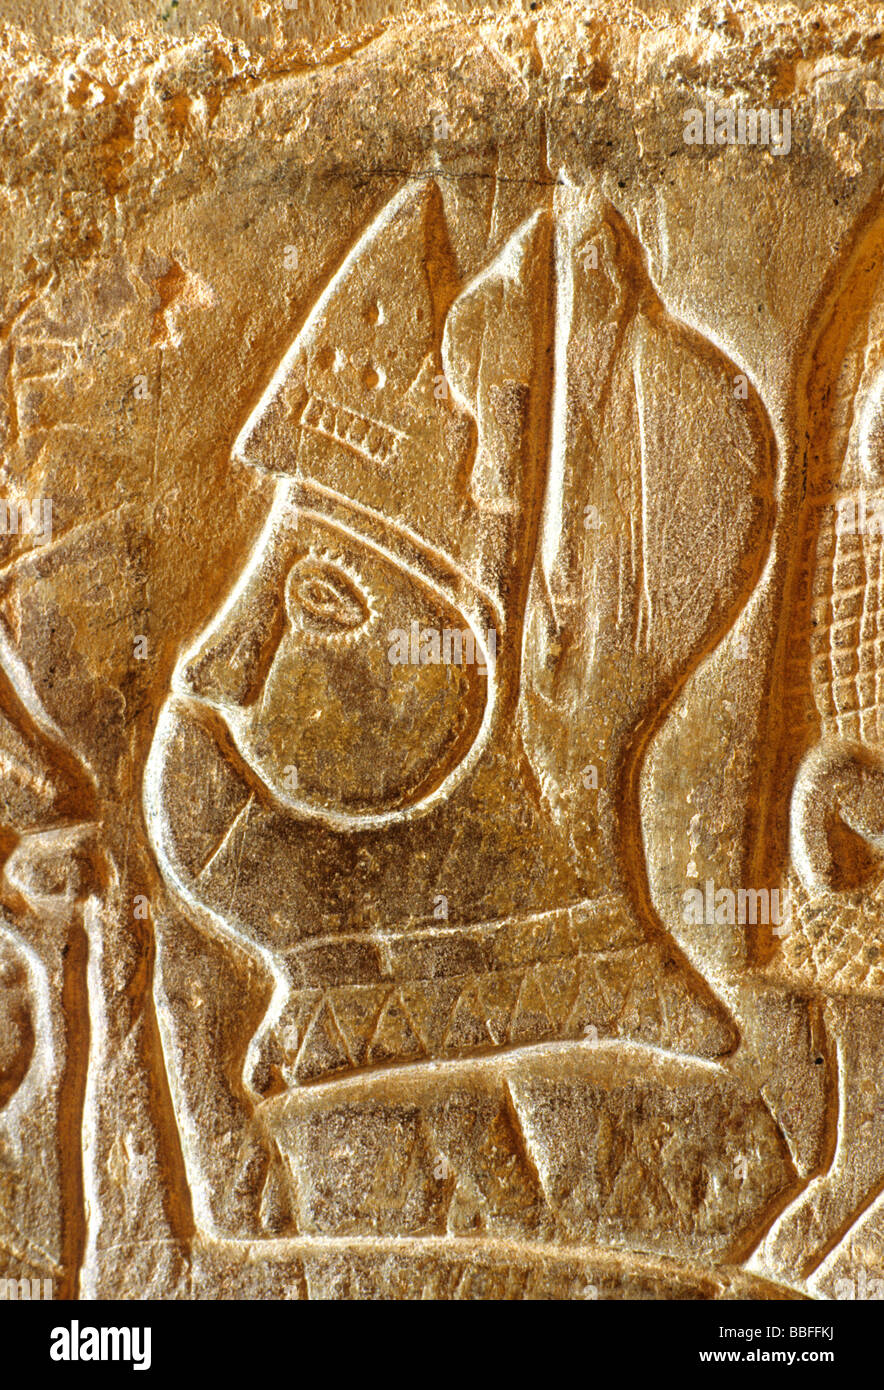 Carlisle Castle prisoner's carving on prison cell wall medieval ...